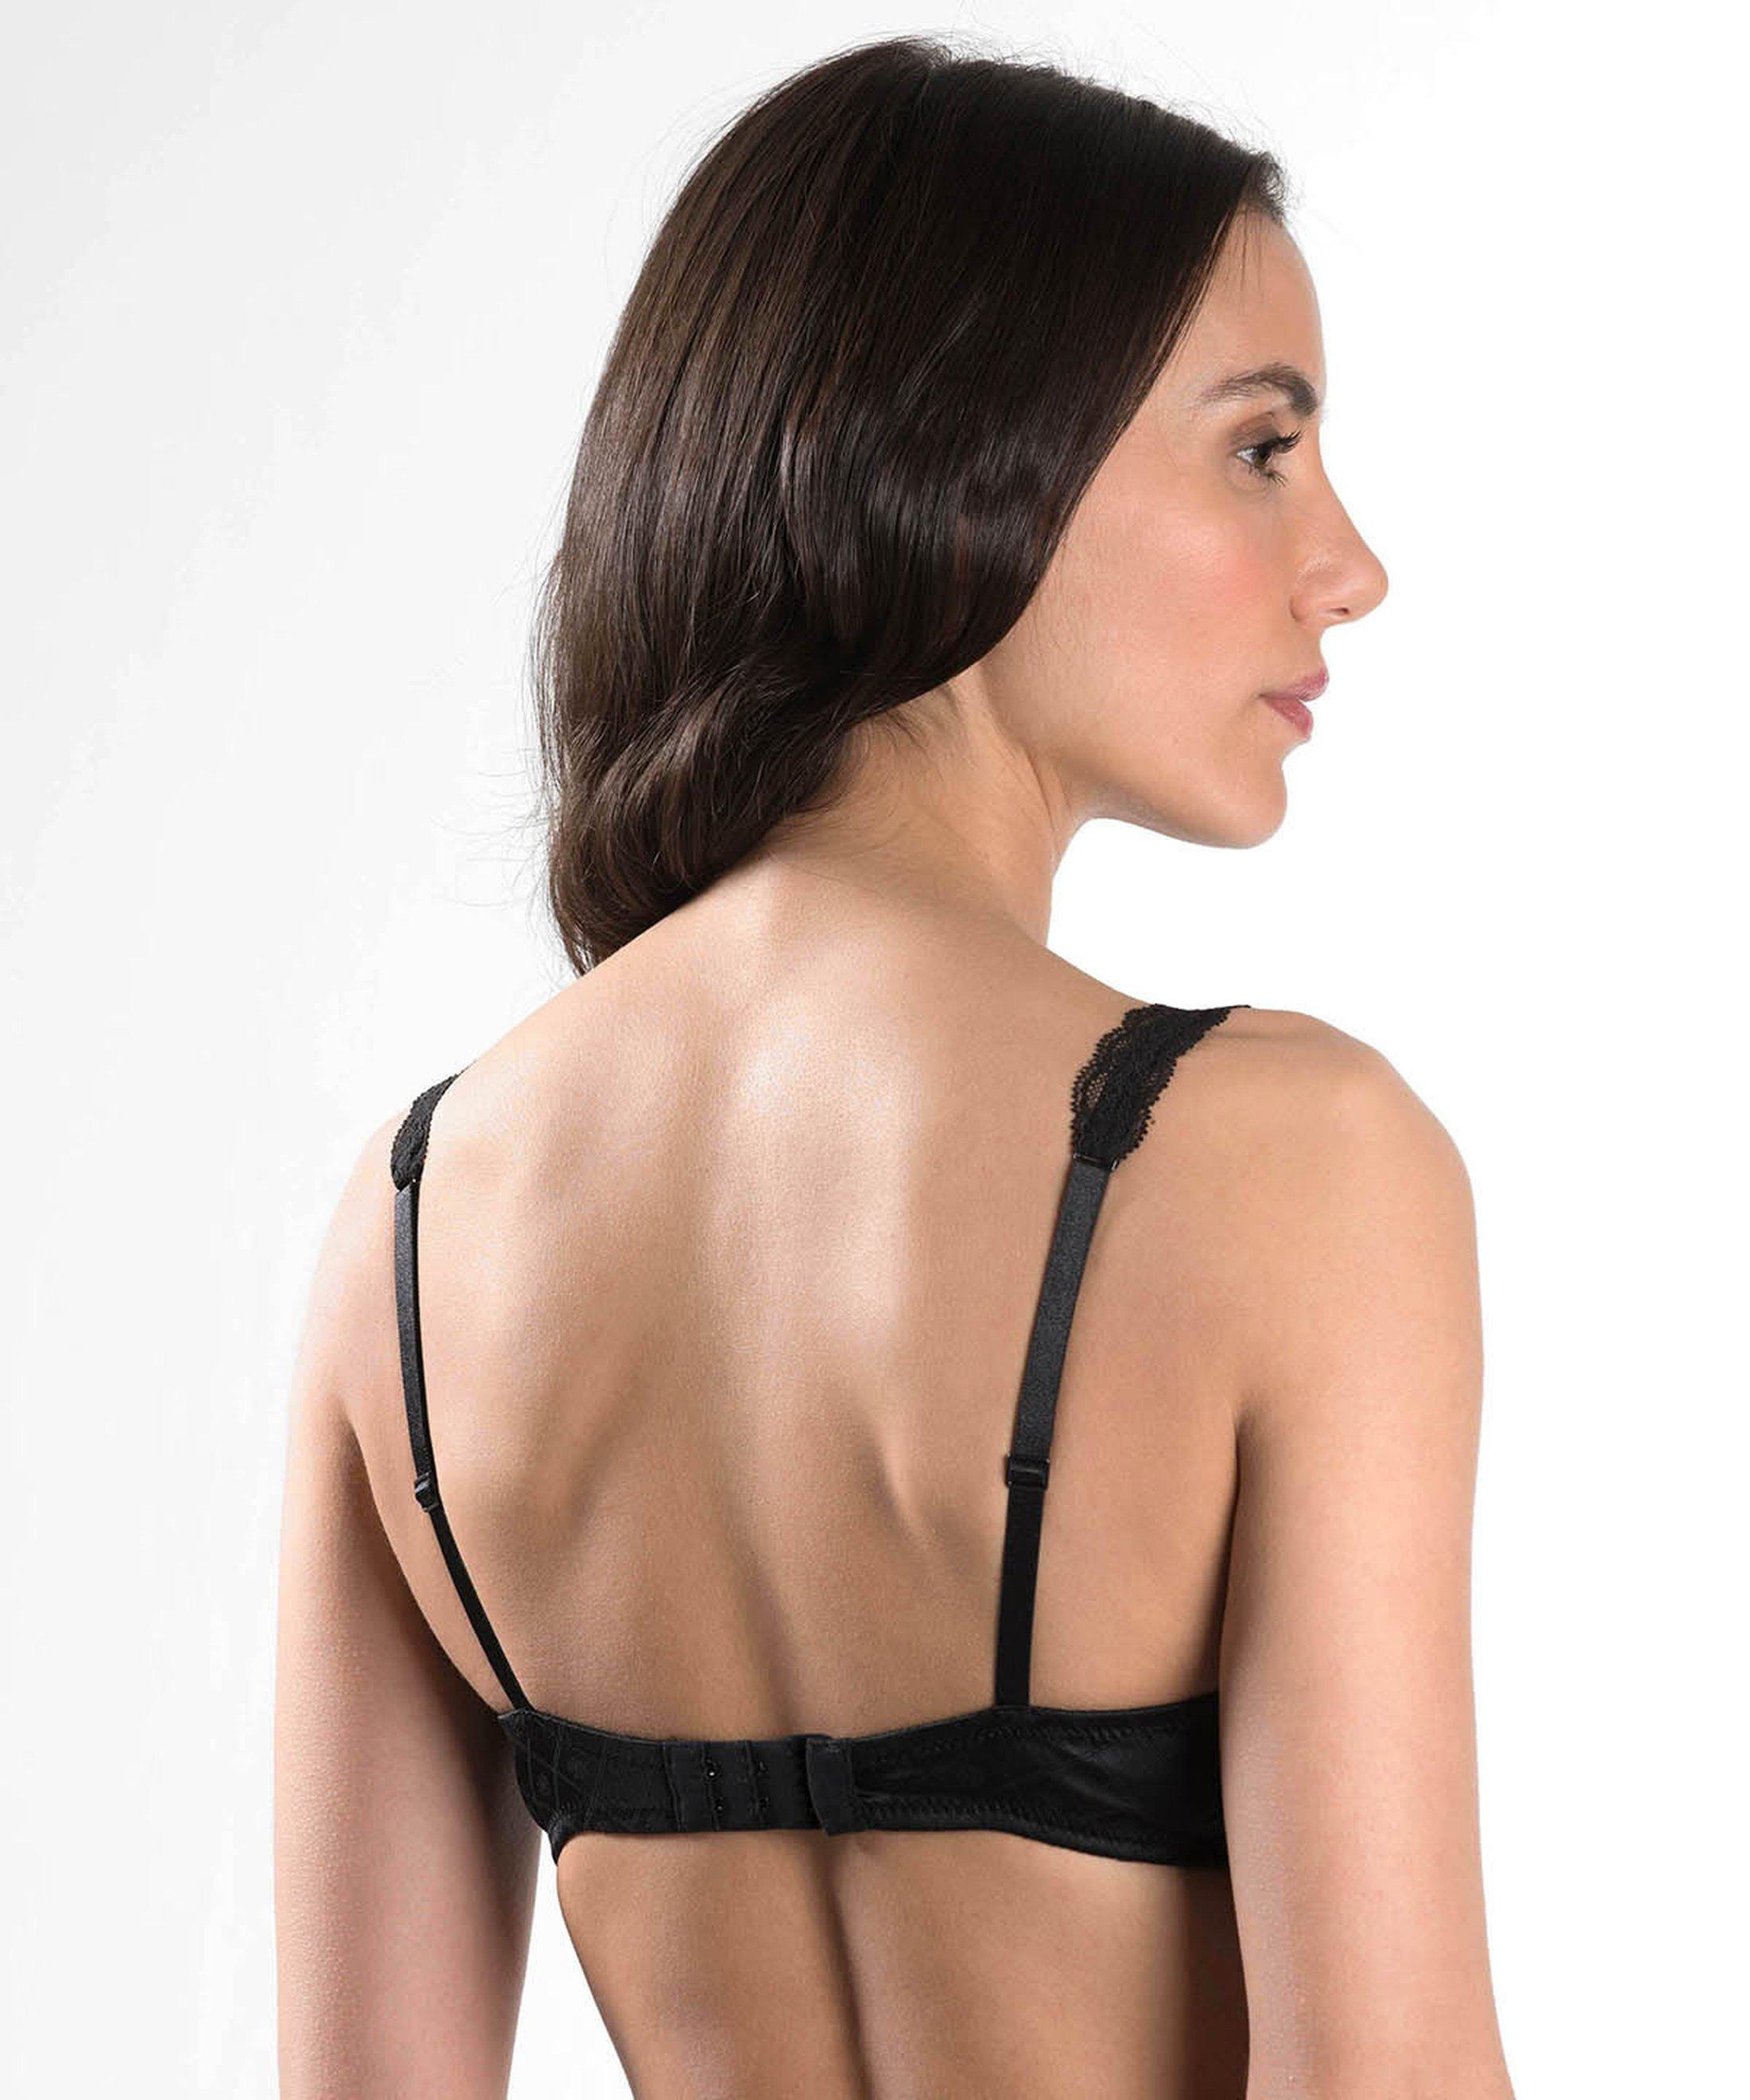 FEMME AUBADE Triangle plunge bra Black | Aubade